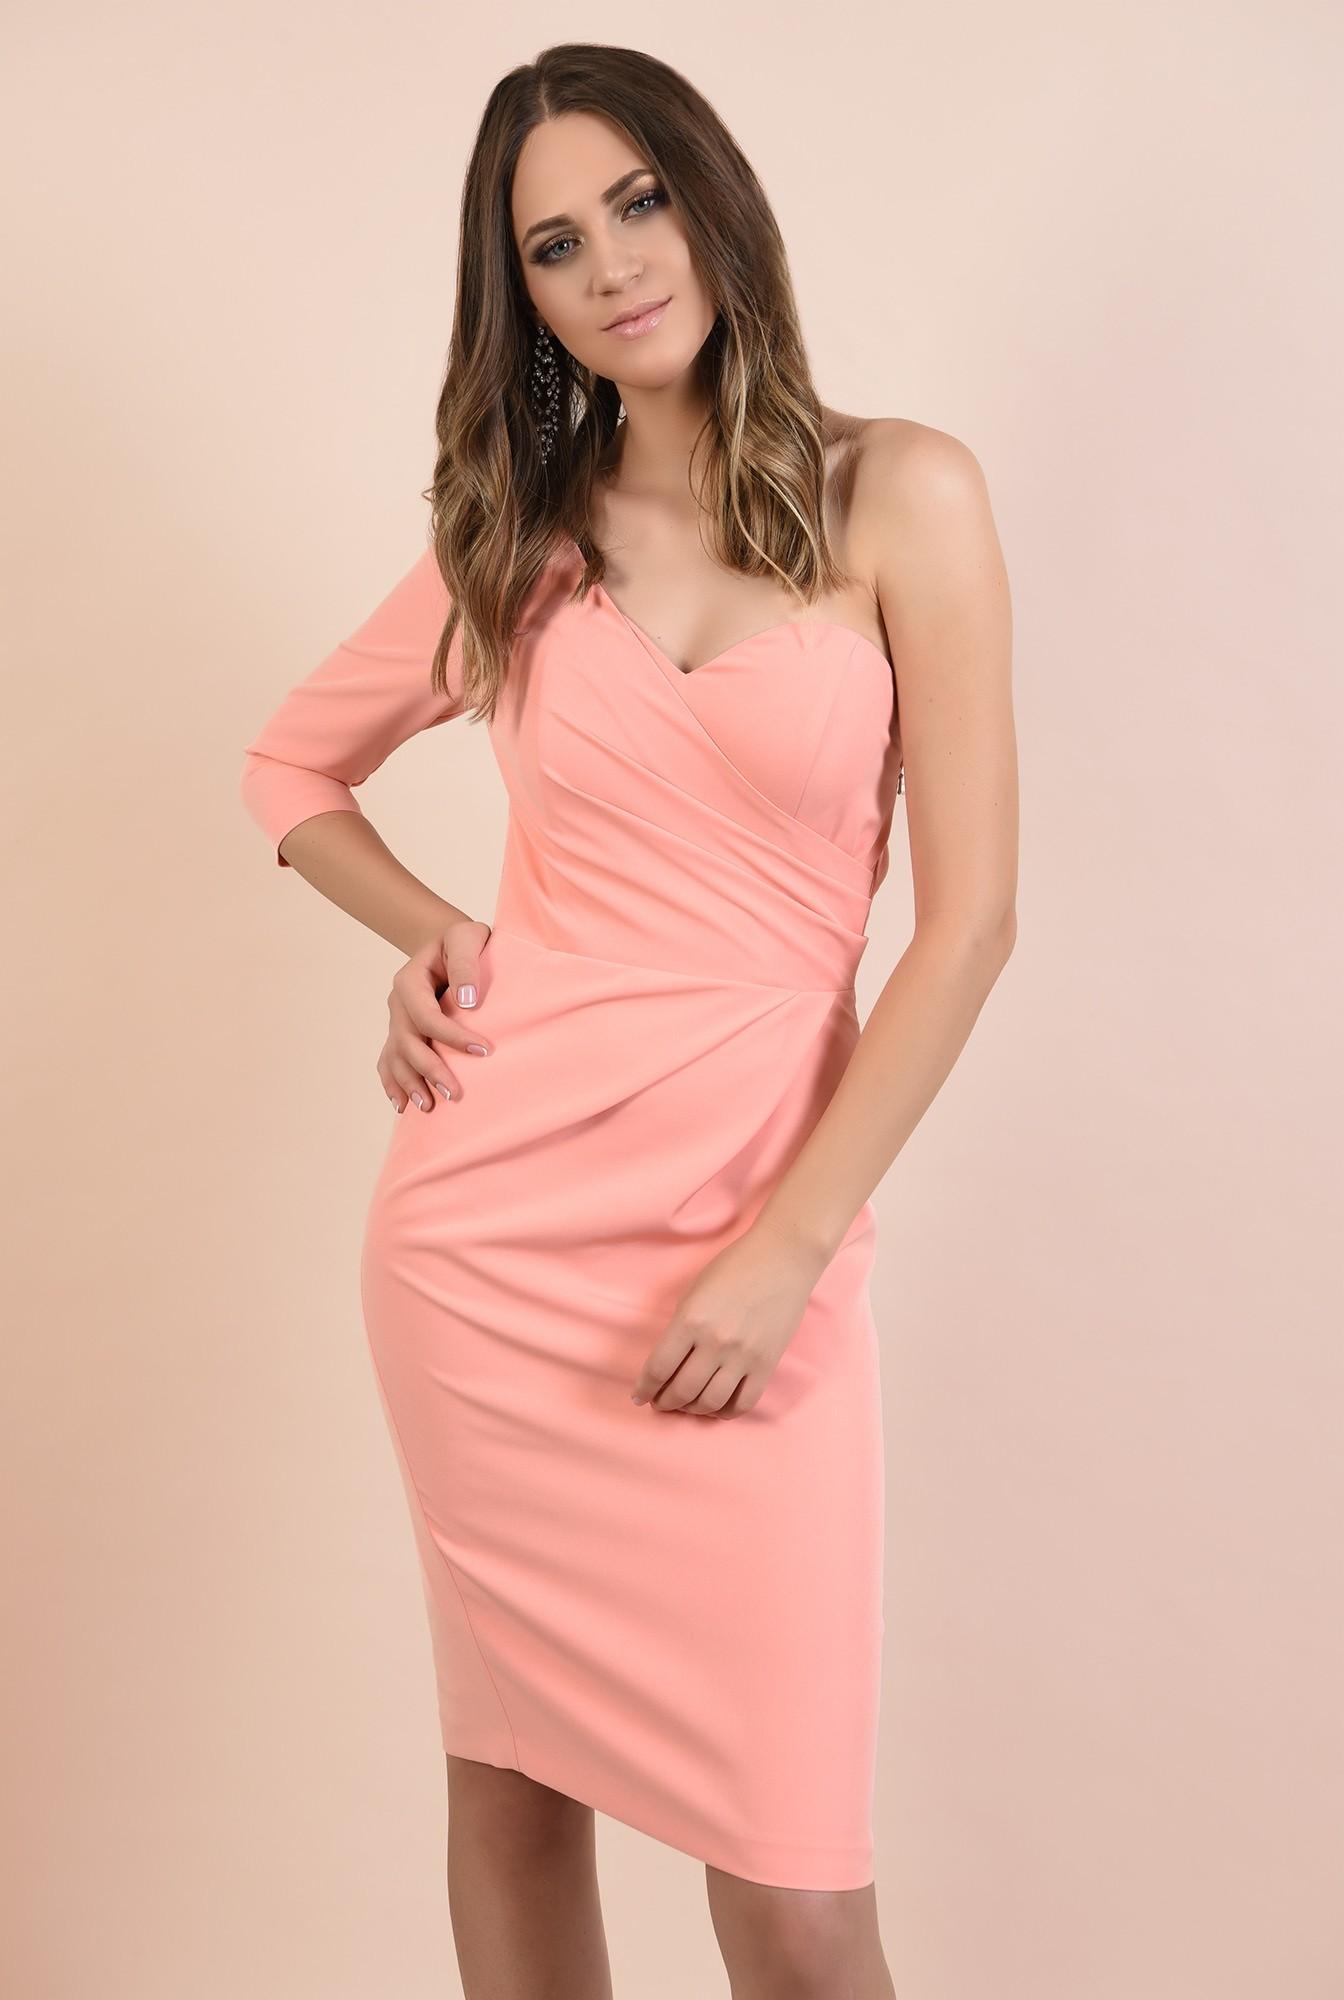 0 - rochie eleganta, decolteu inima, o maneca, croi conic, midi, Poema, roz somon